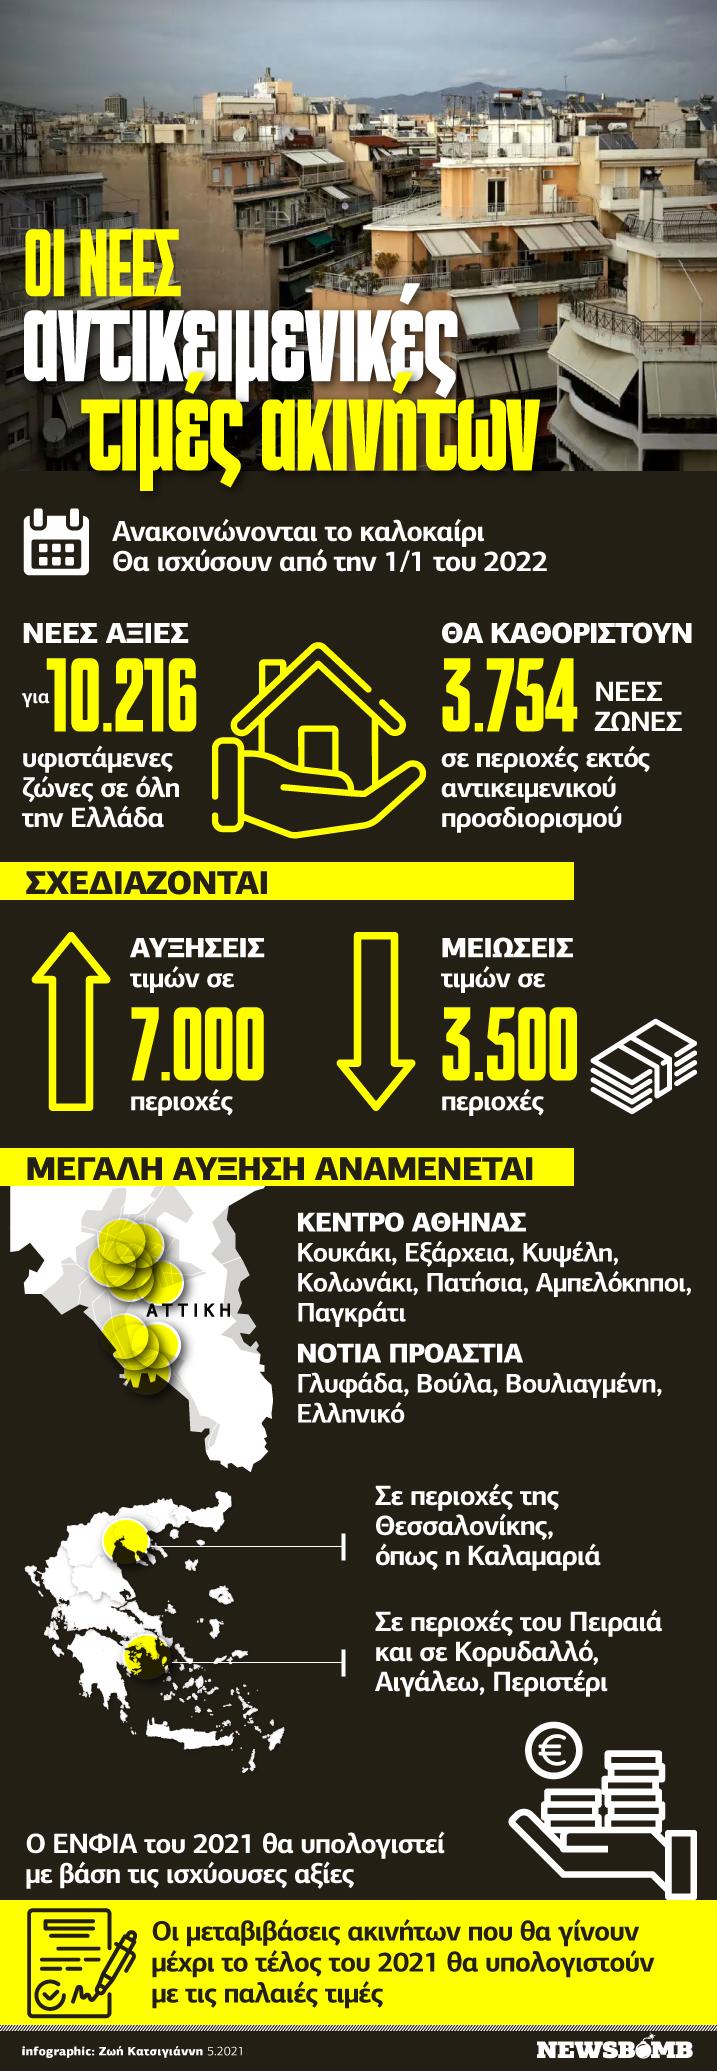 Infographic αντικειμενικές αξίες